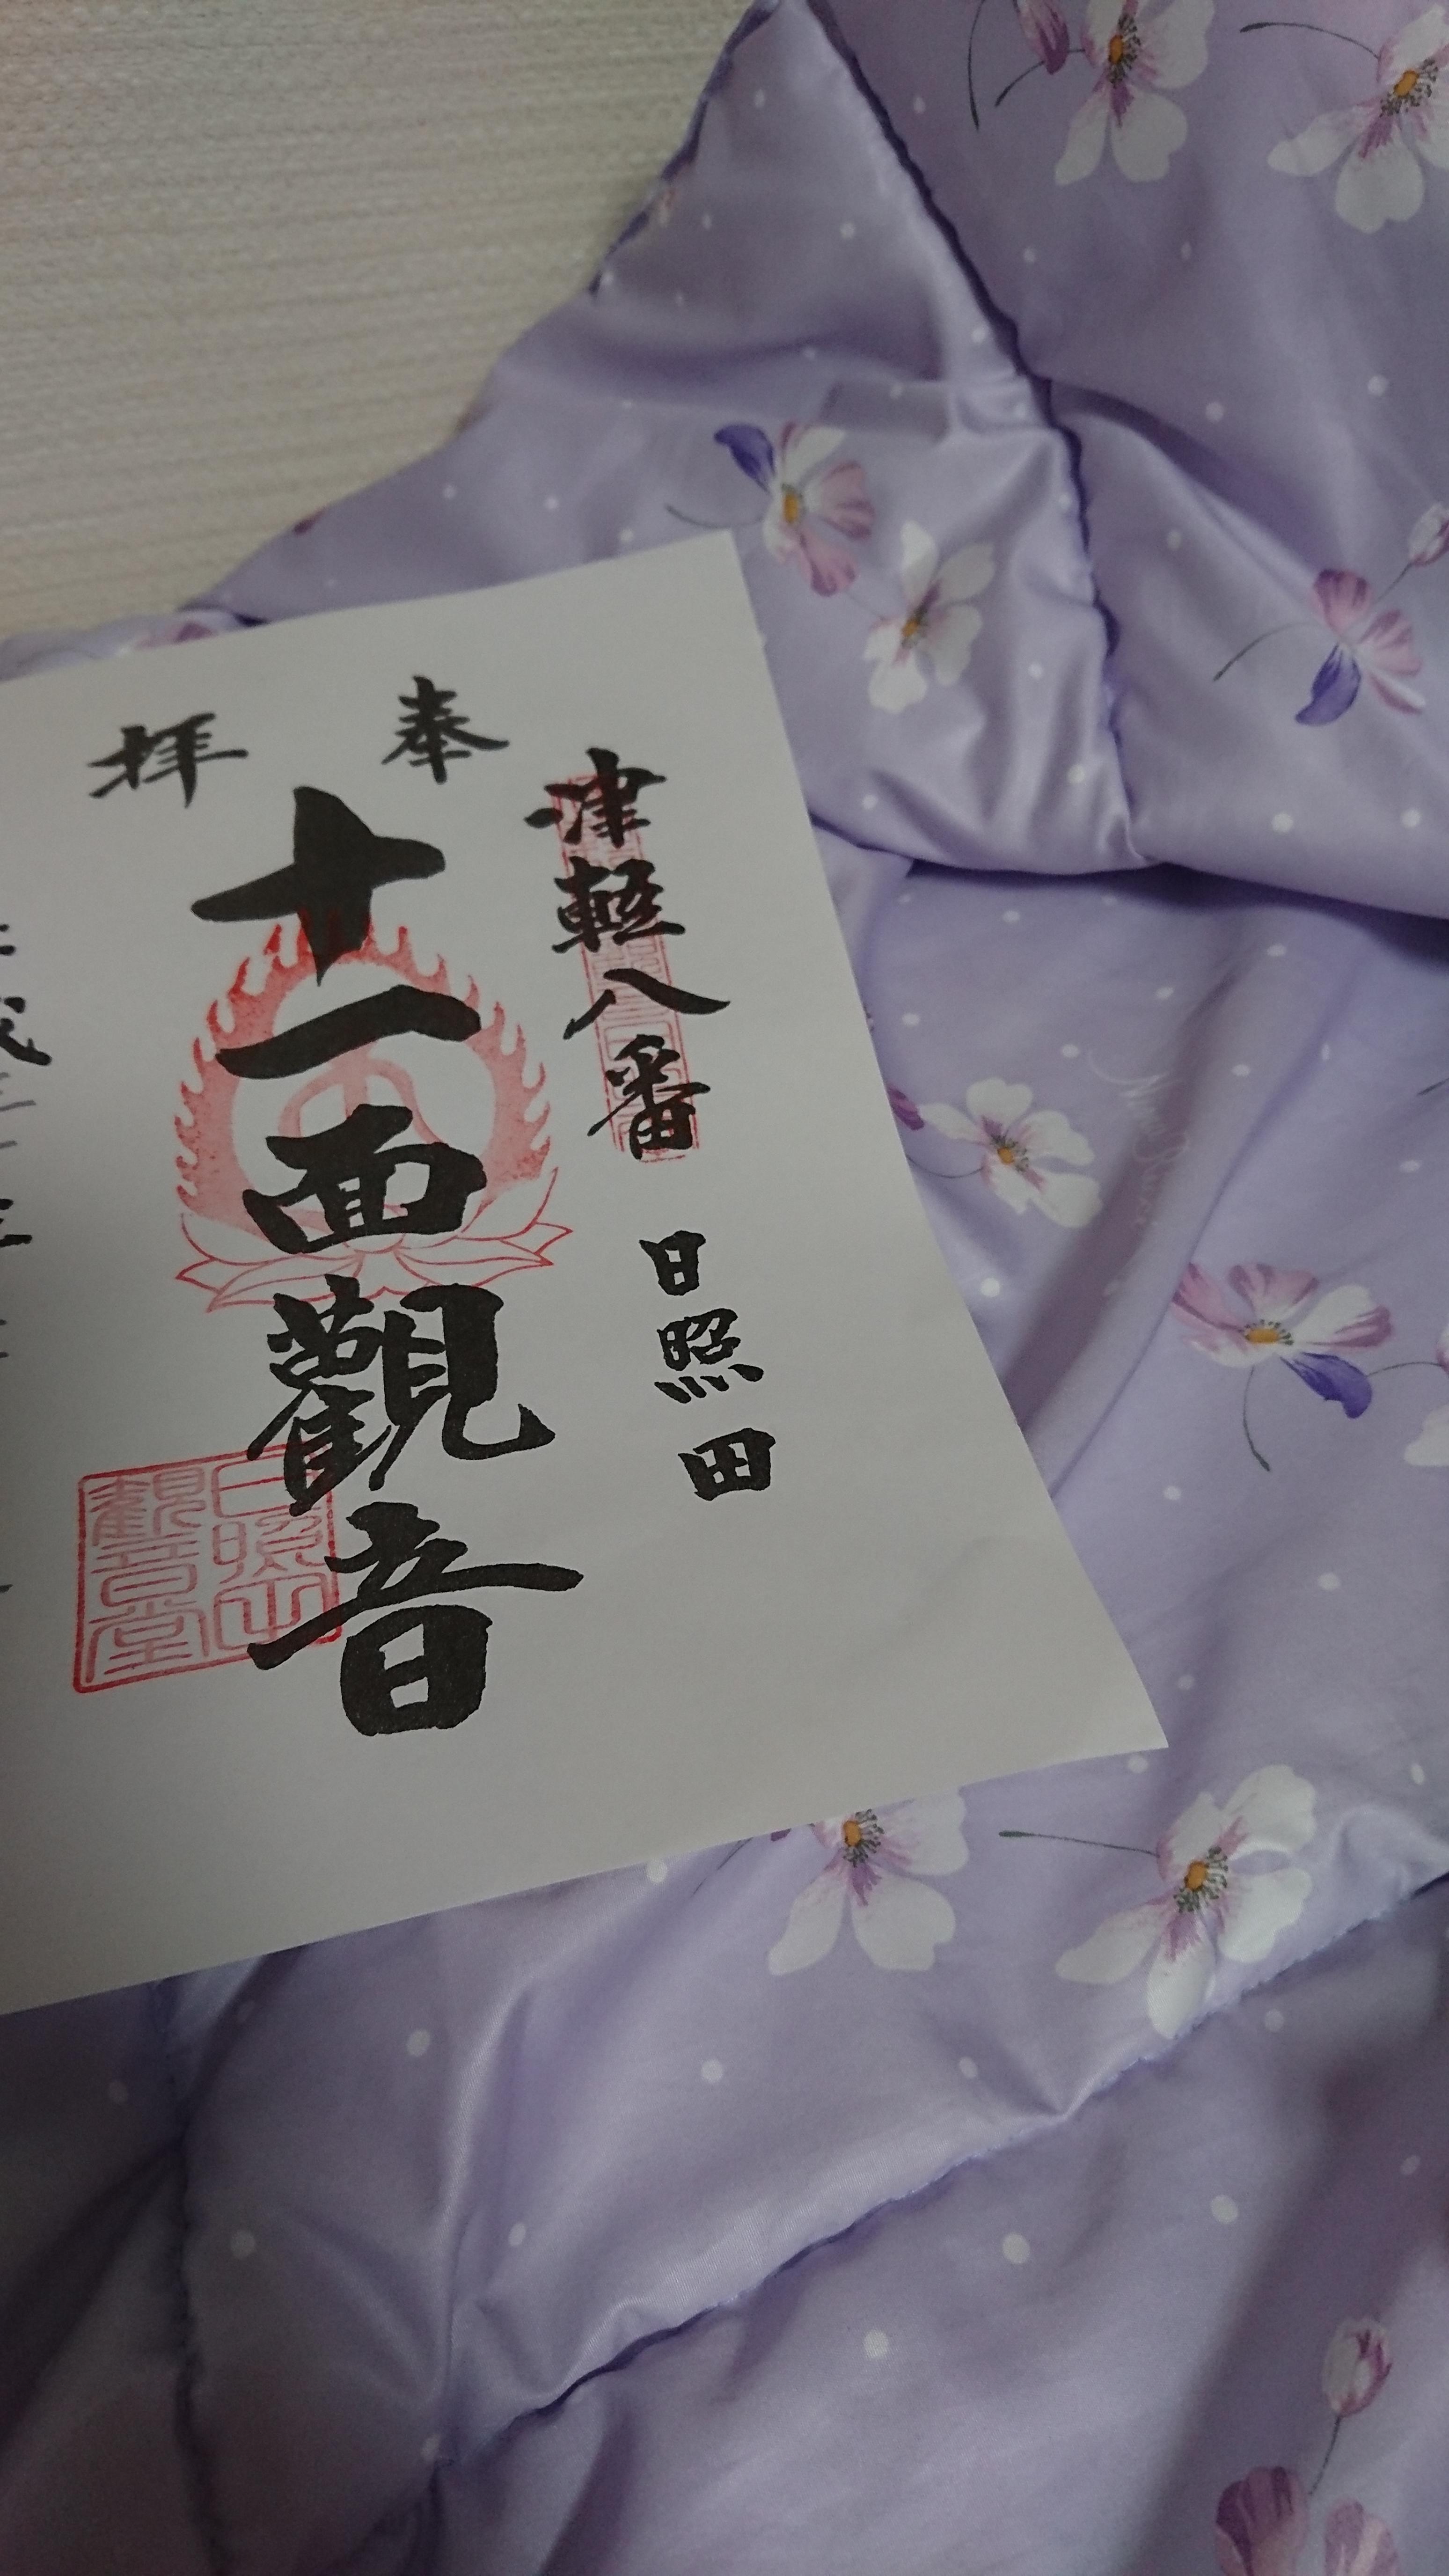 高倉神社の御朱印